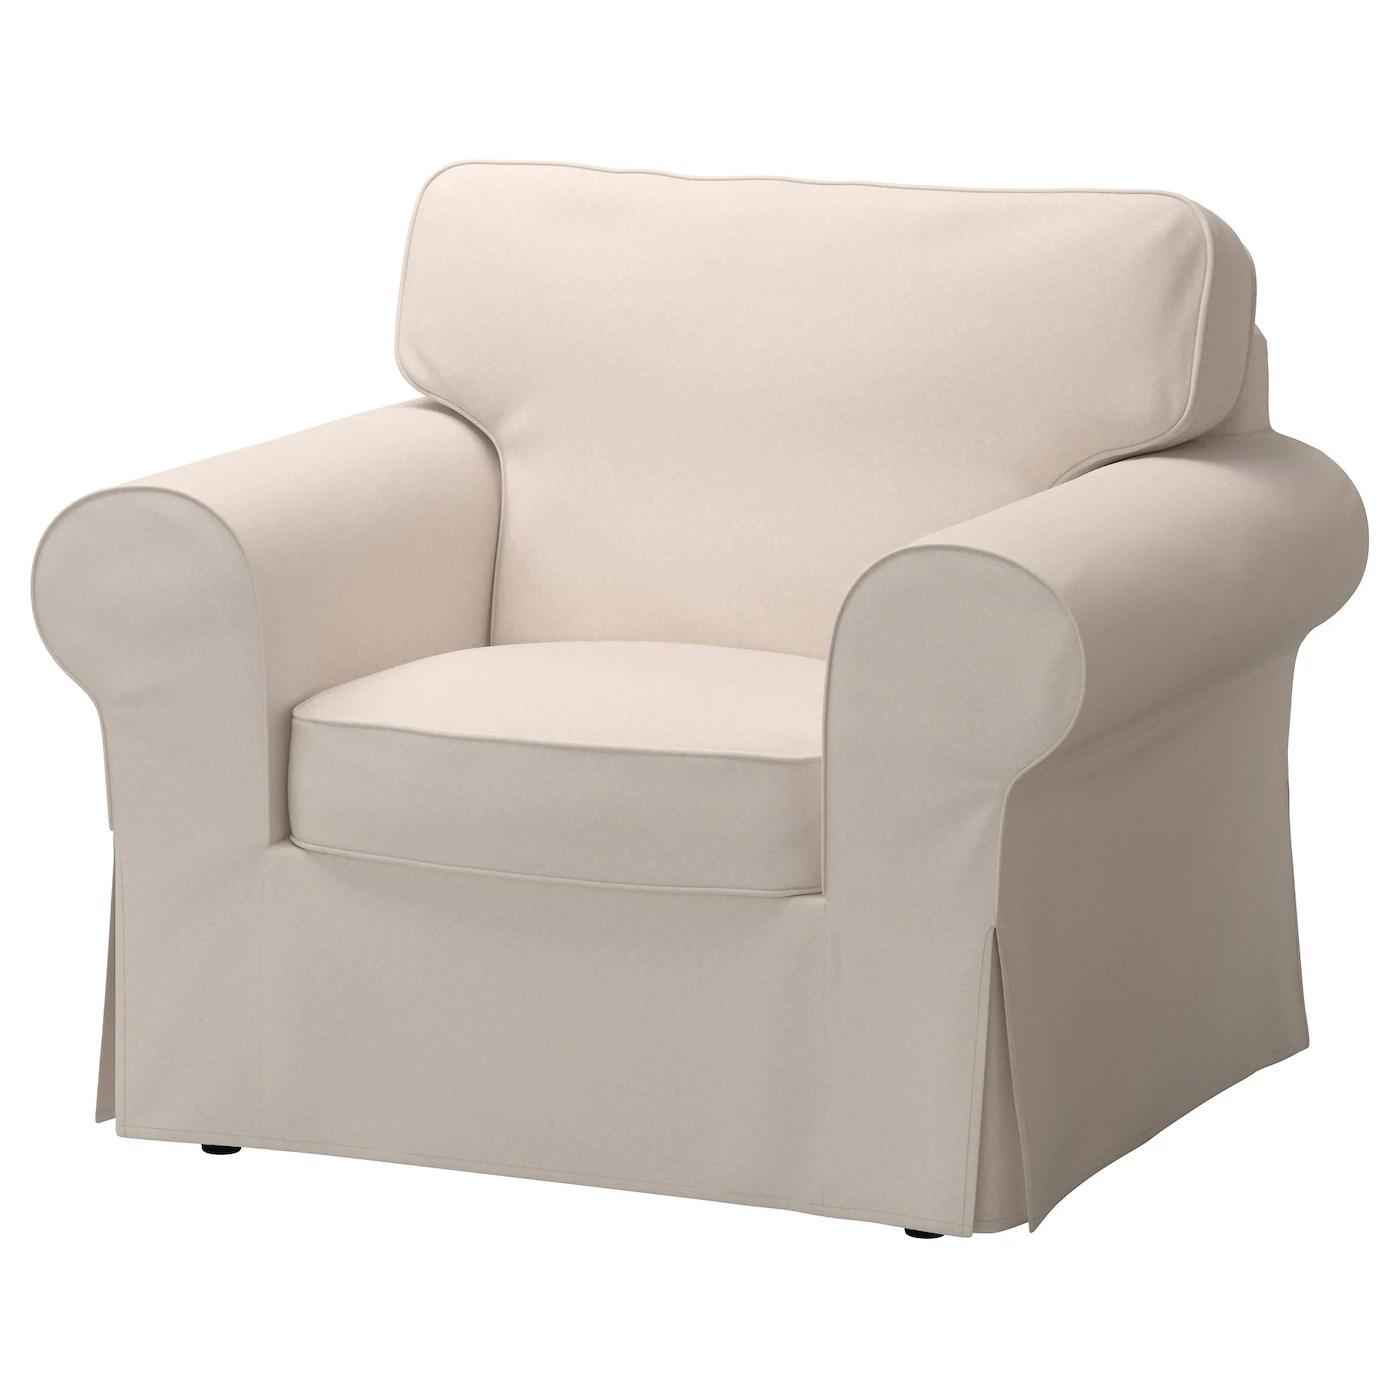 sofa chair covers ikea fisher price bouncy ektorp armchair lofallet beige